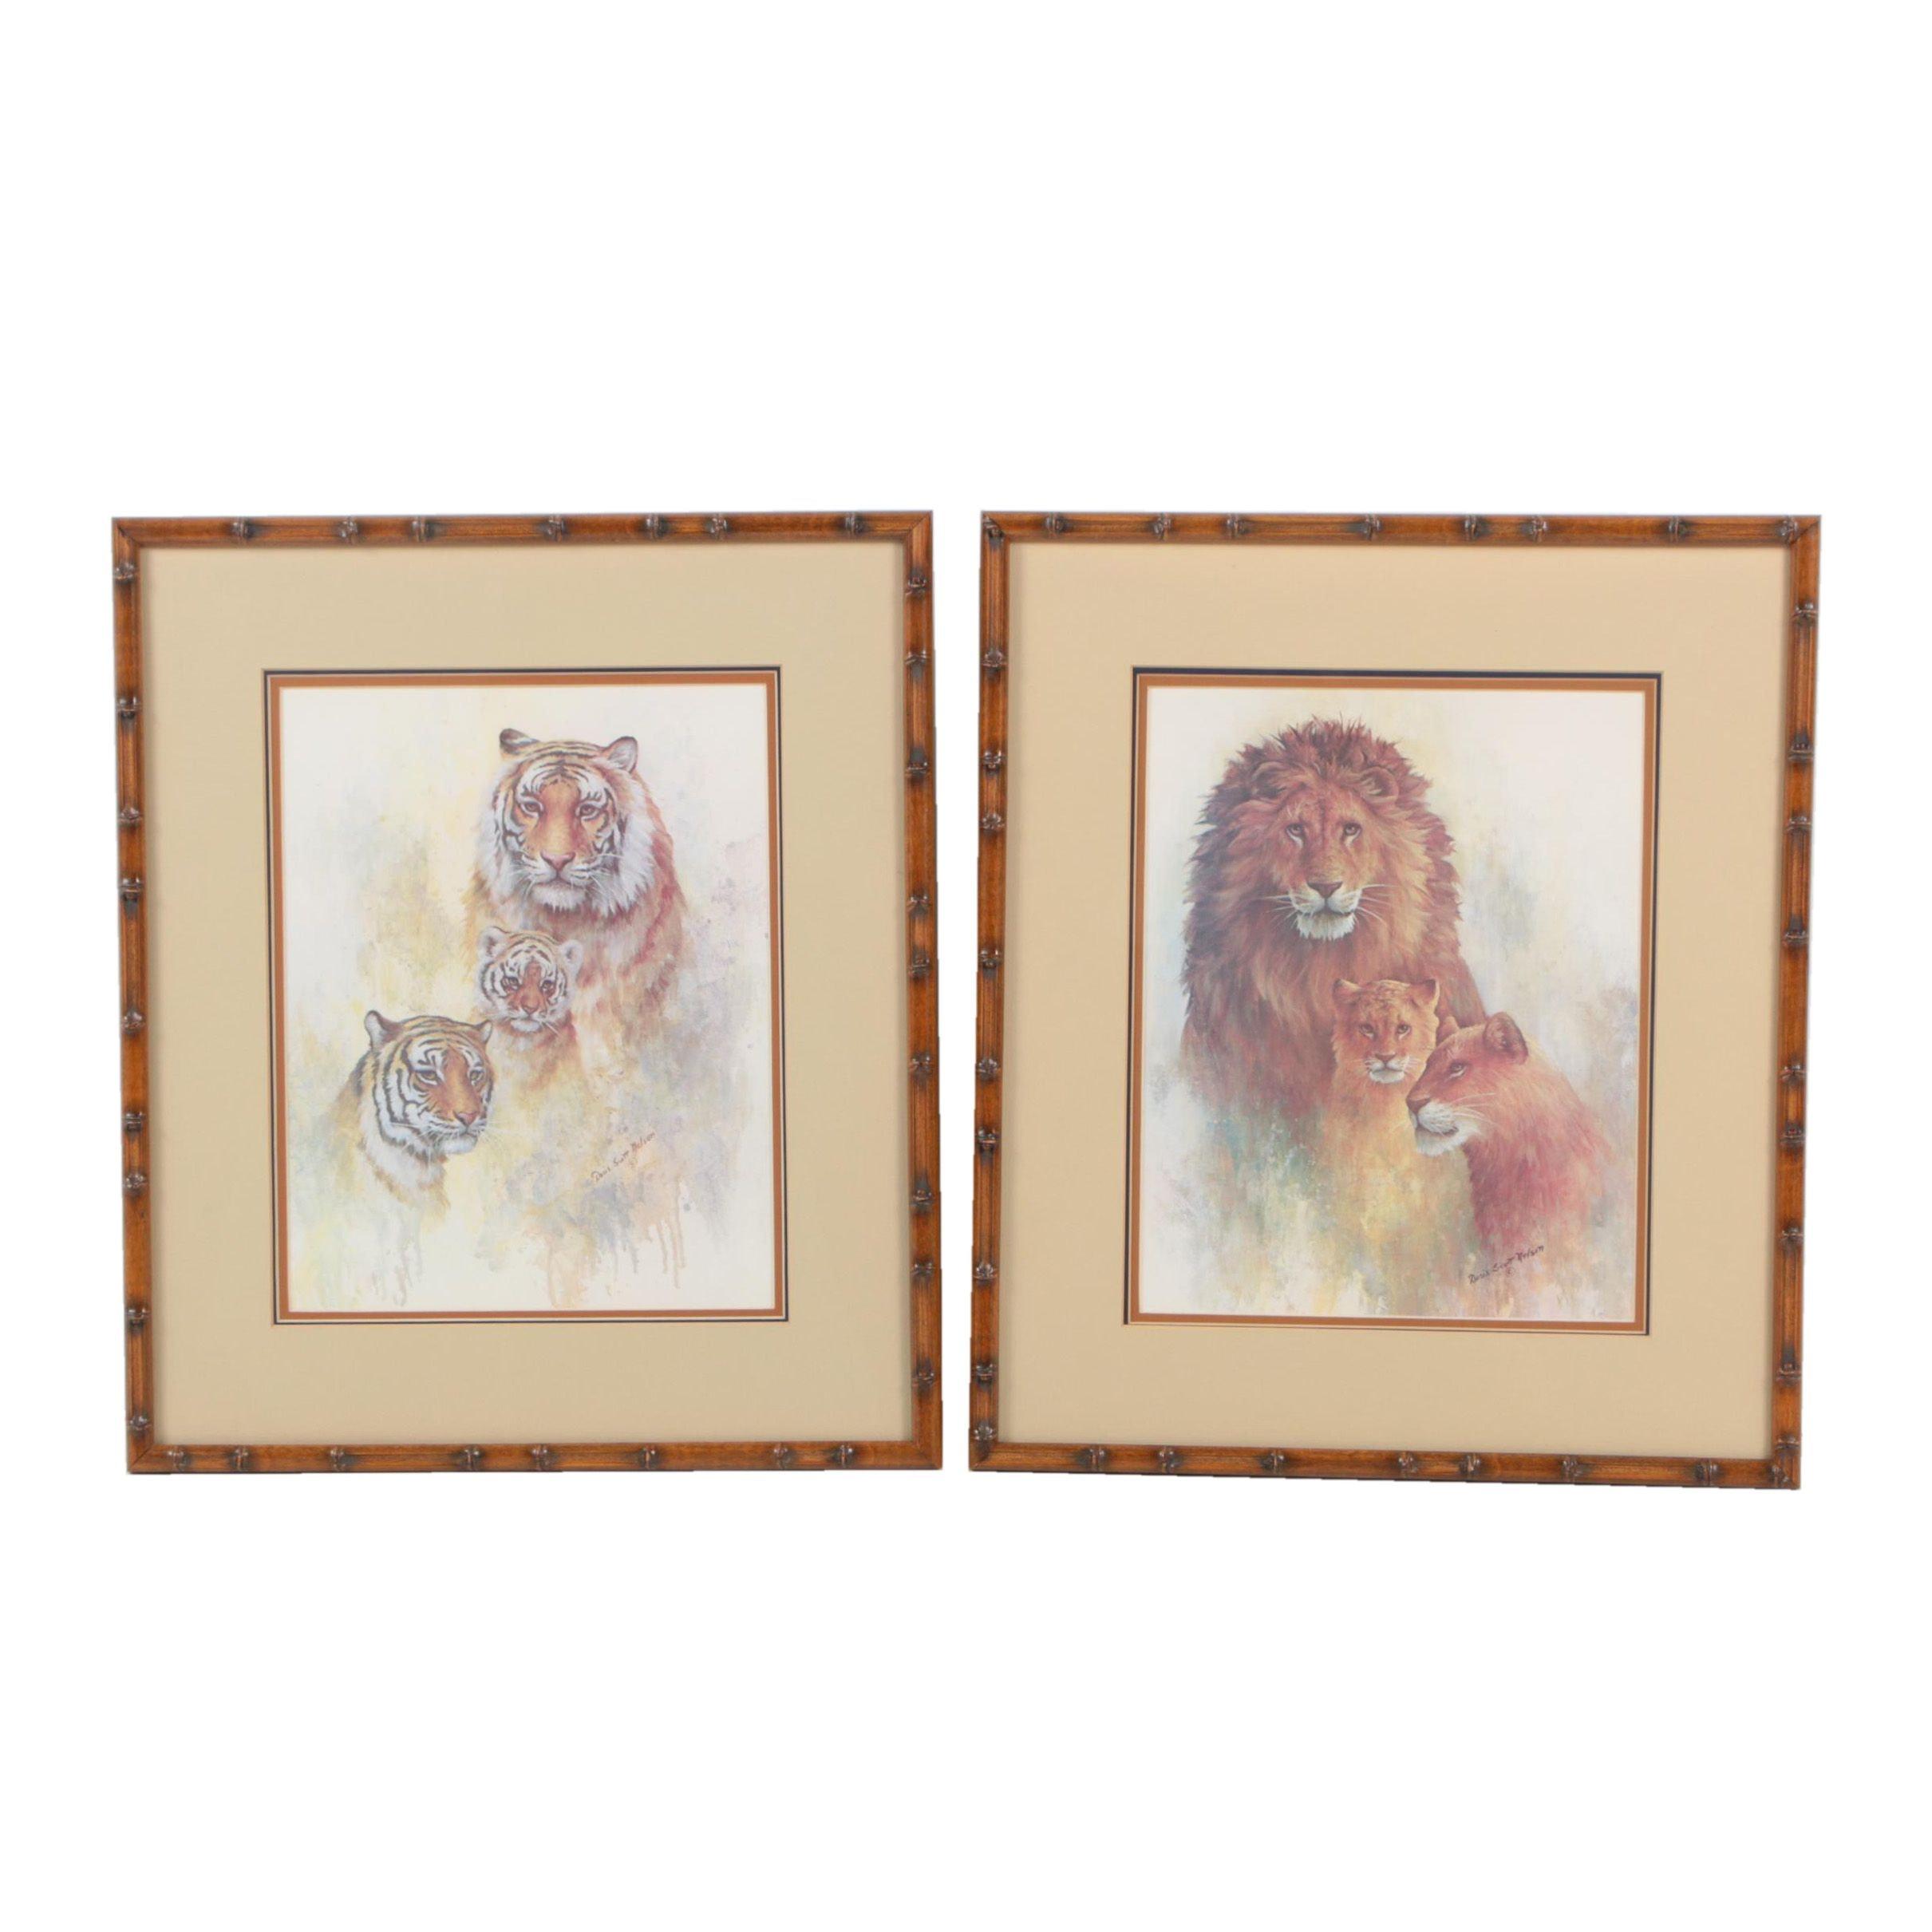 Offset Lithographs After Big Cat Illustrations by Doris Scott Nelson